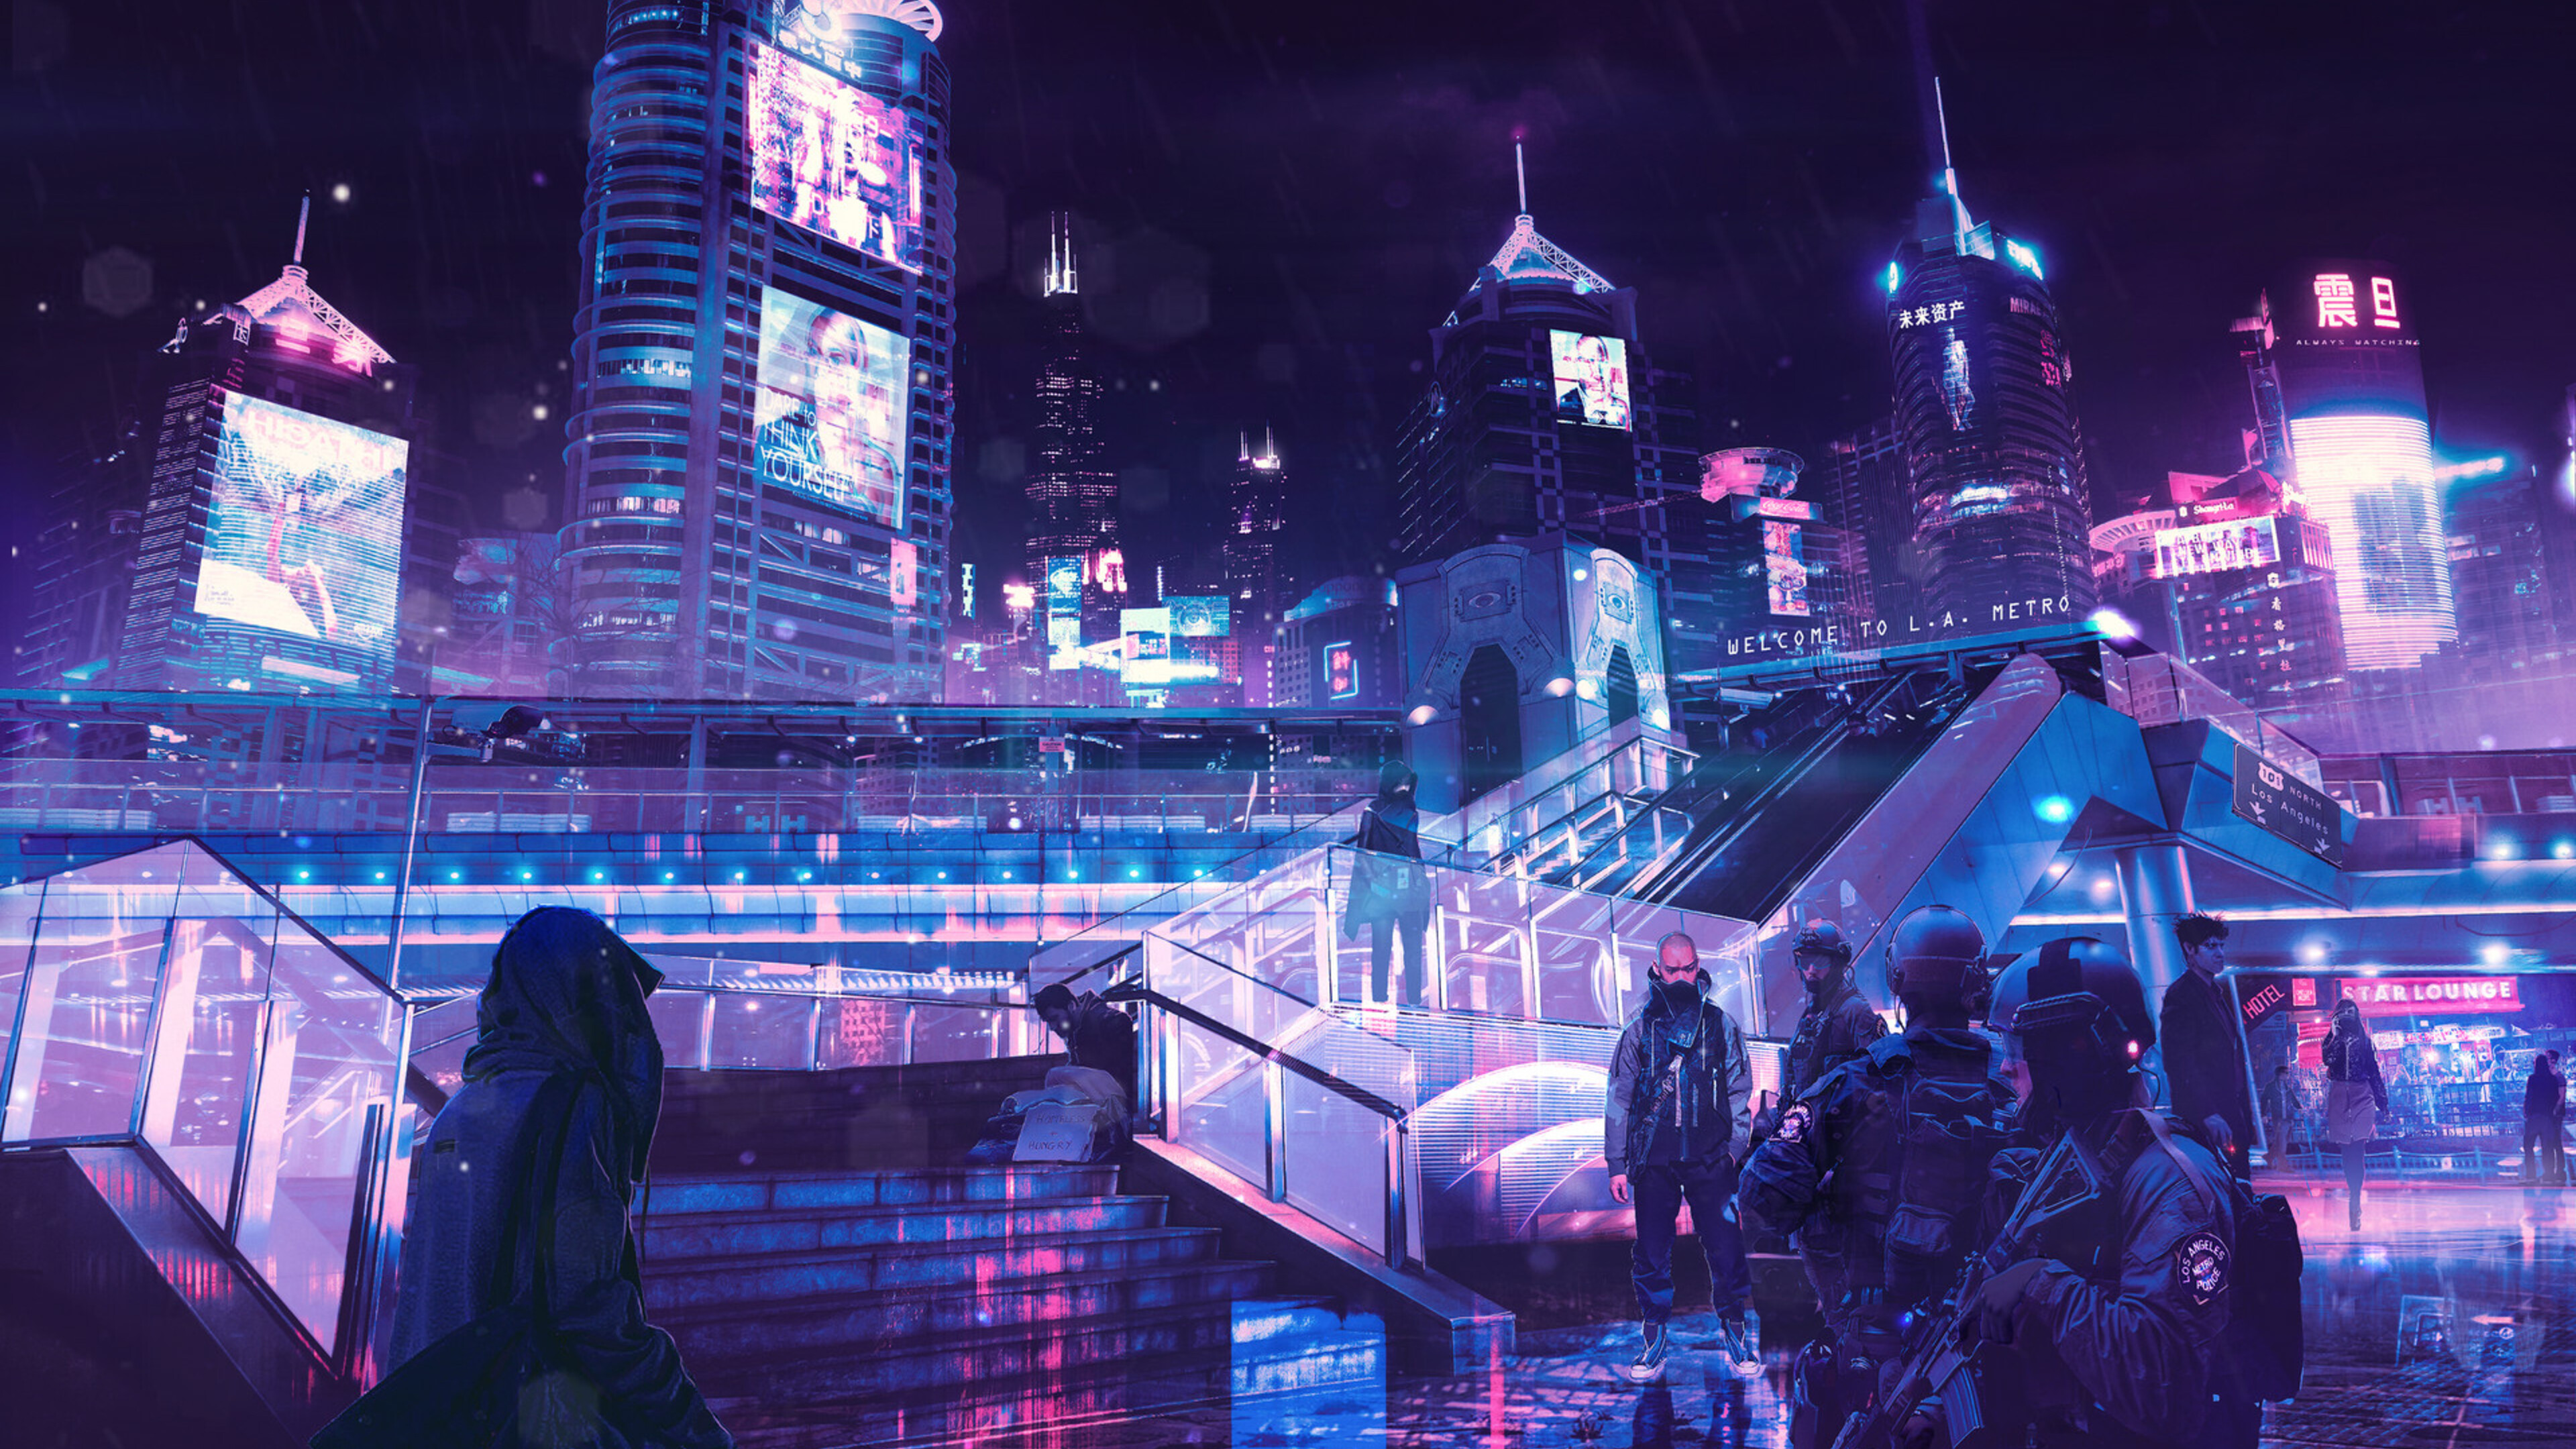 3840x2160 Cyberpunk Neon City 4k Hd 4k Wallpapers Images